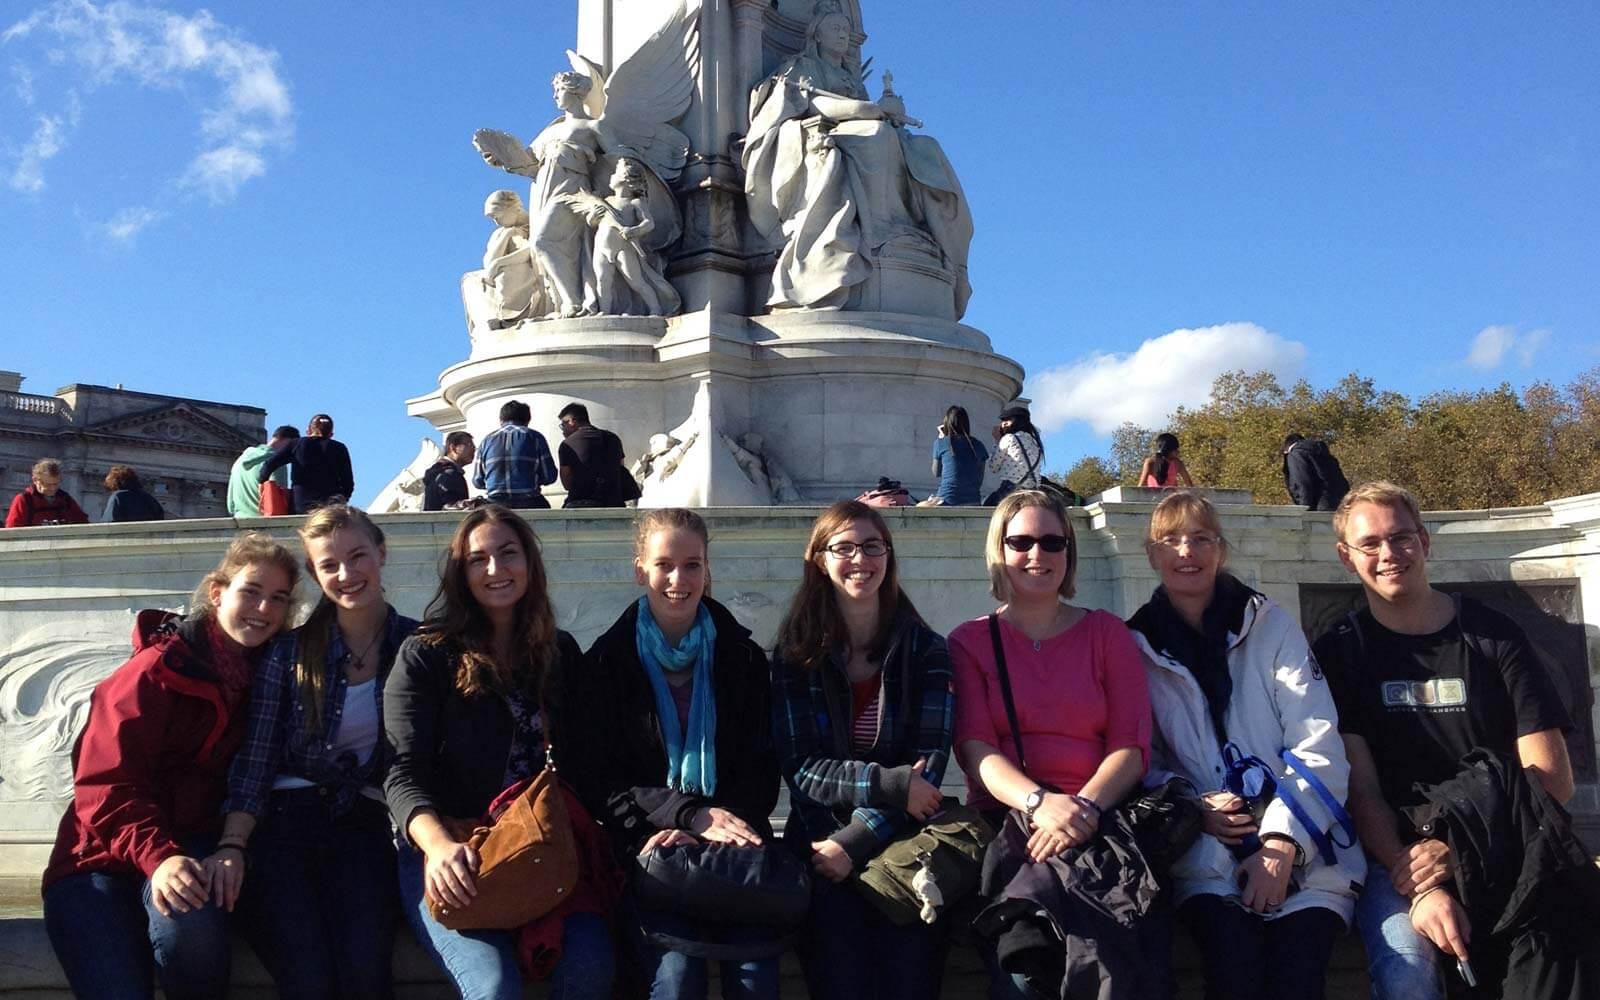 Luisas und Freunde am Victoria Memorial Monument in London